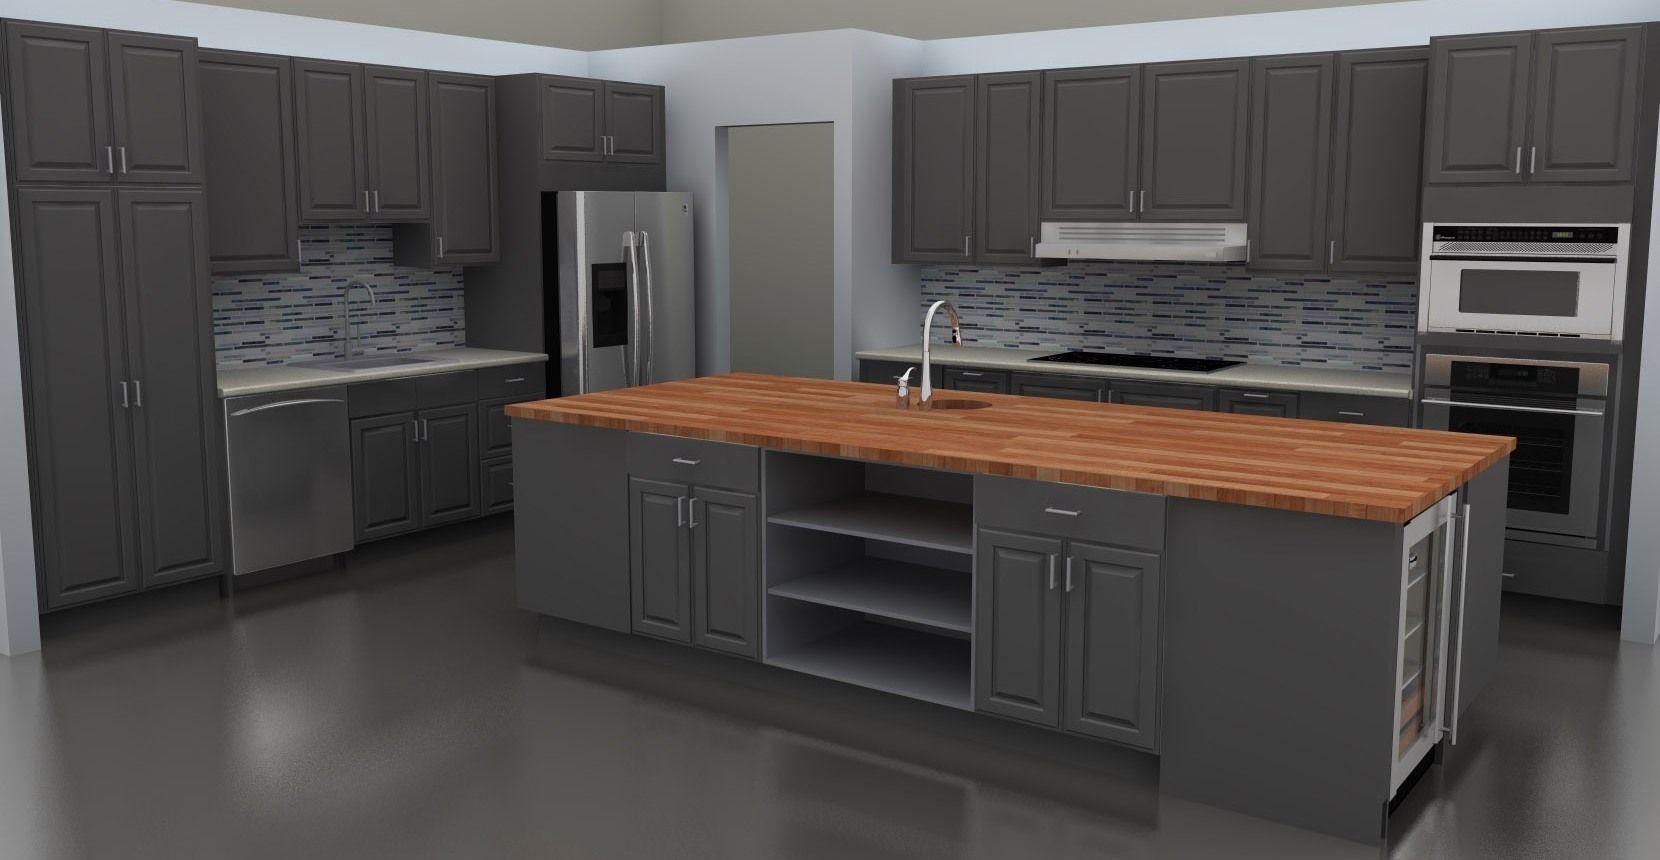 Stylish Lidingo Gray Doors For A New Ikea Kitchen Modern Grey